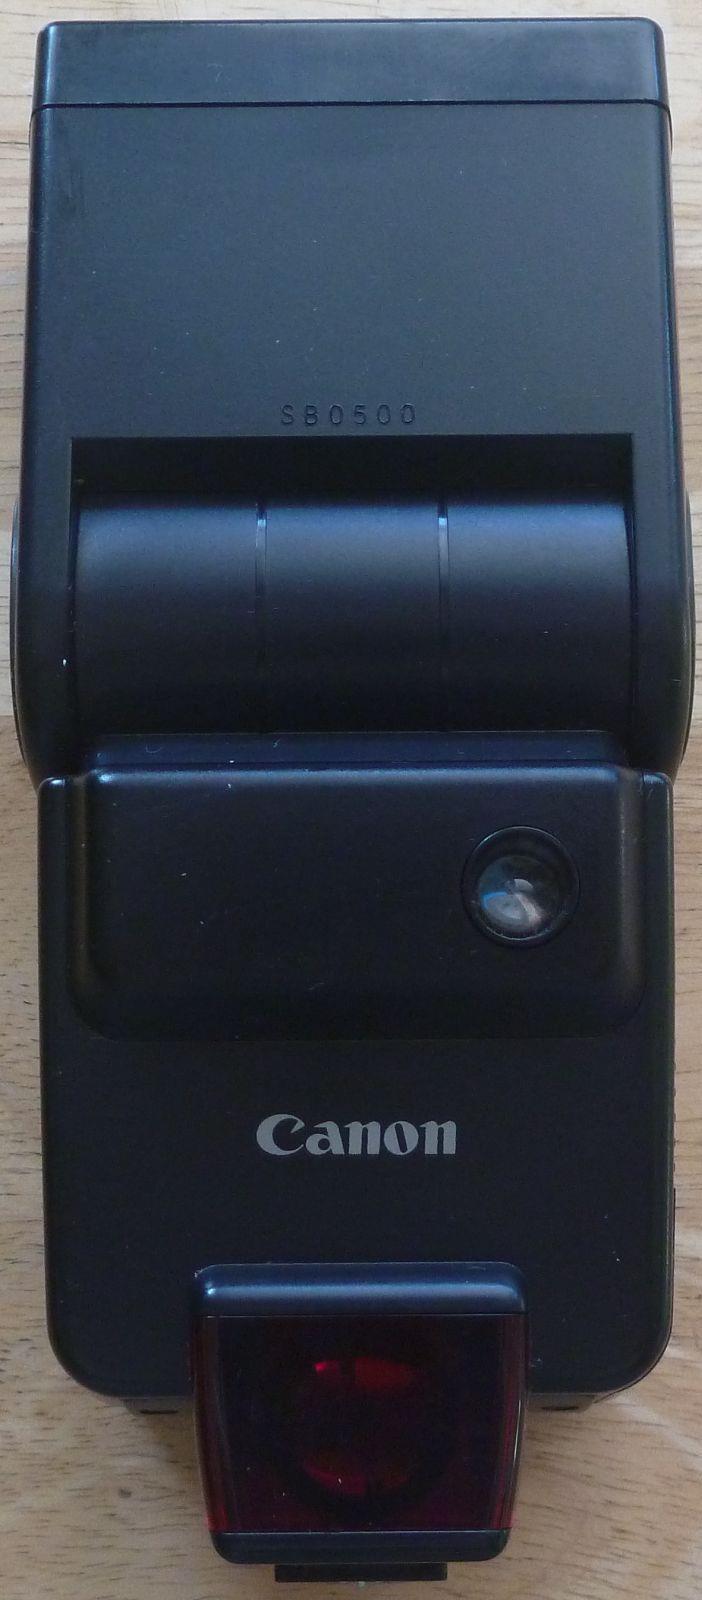 Canon Speedlite 420EZ Shoe Mount Flash for Canon. Tested. Good Condition.